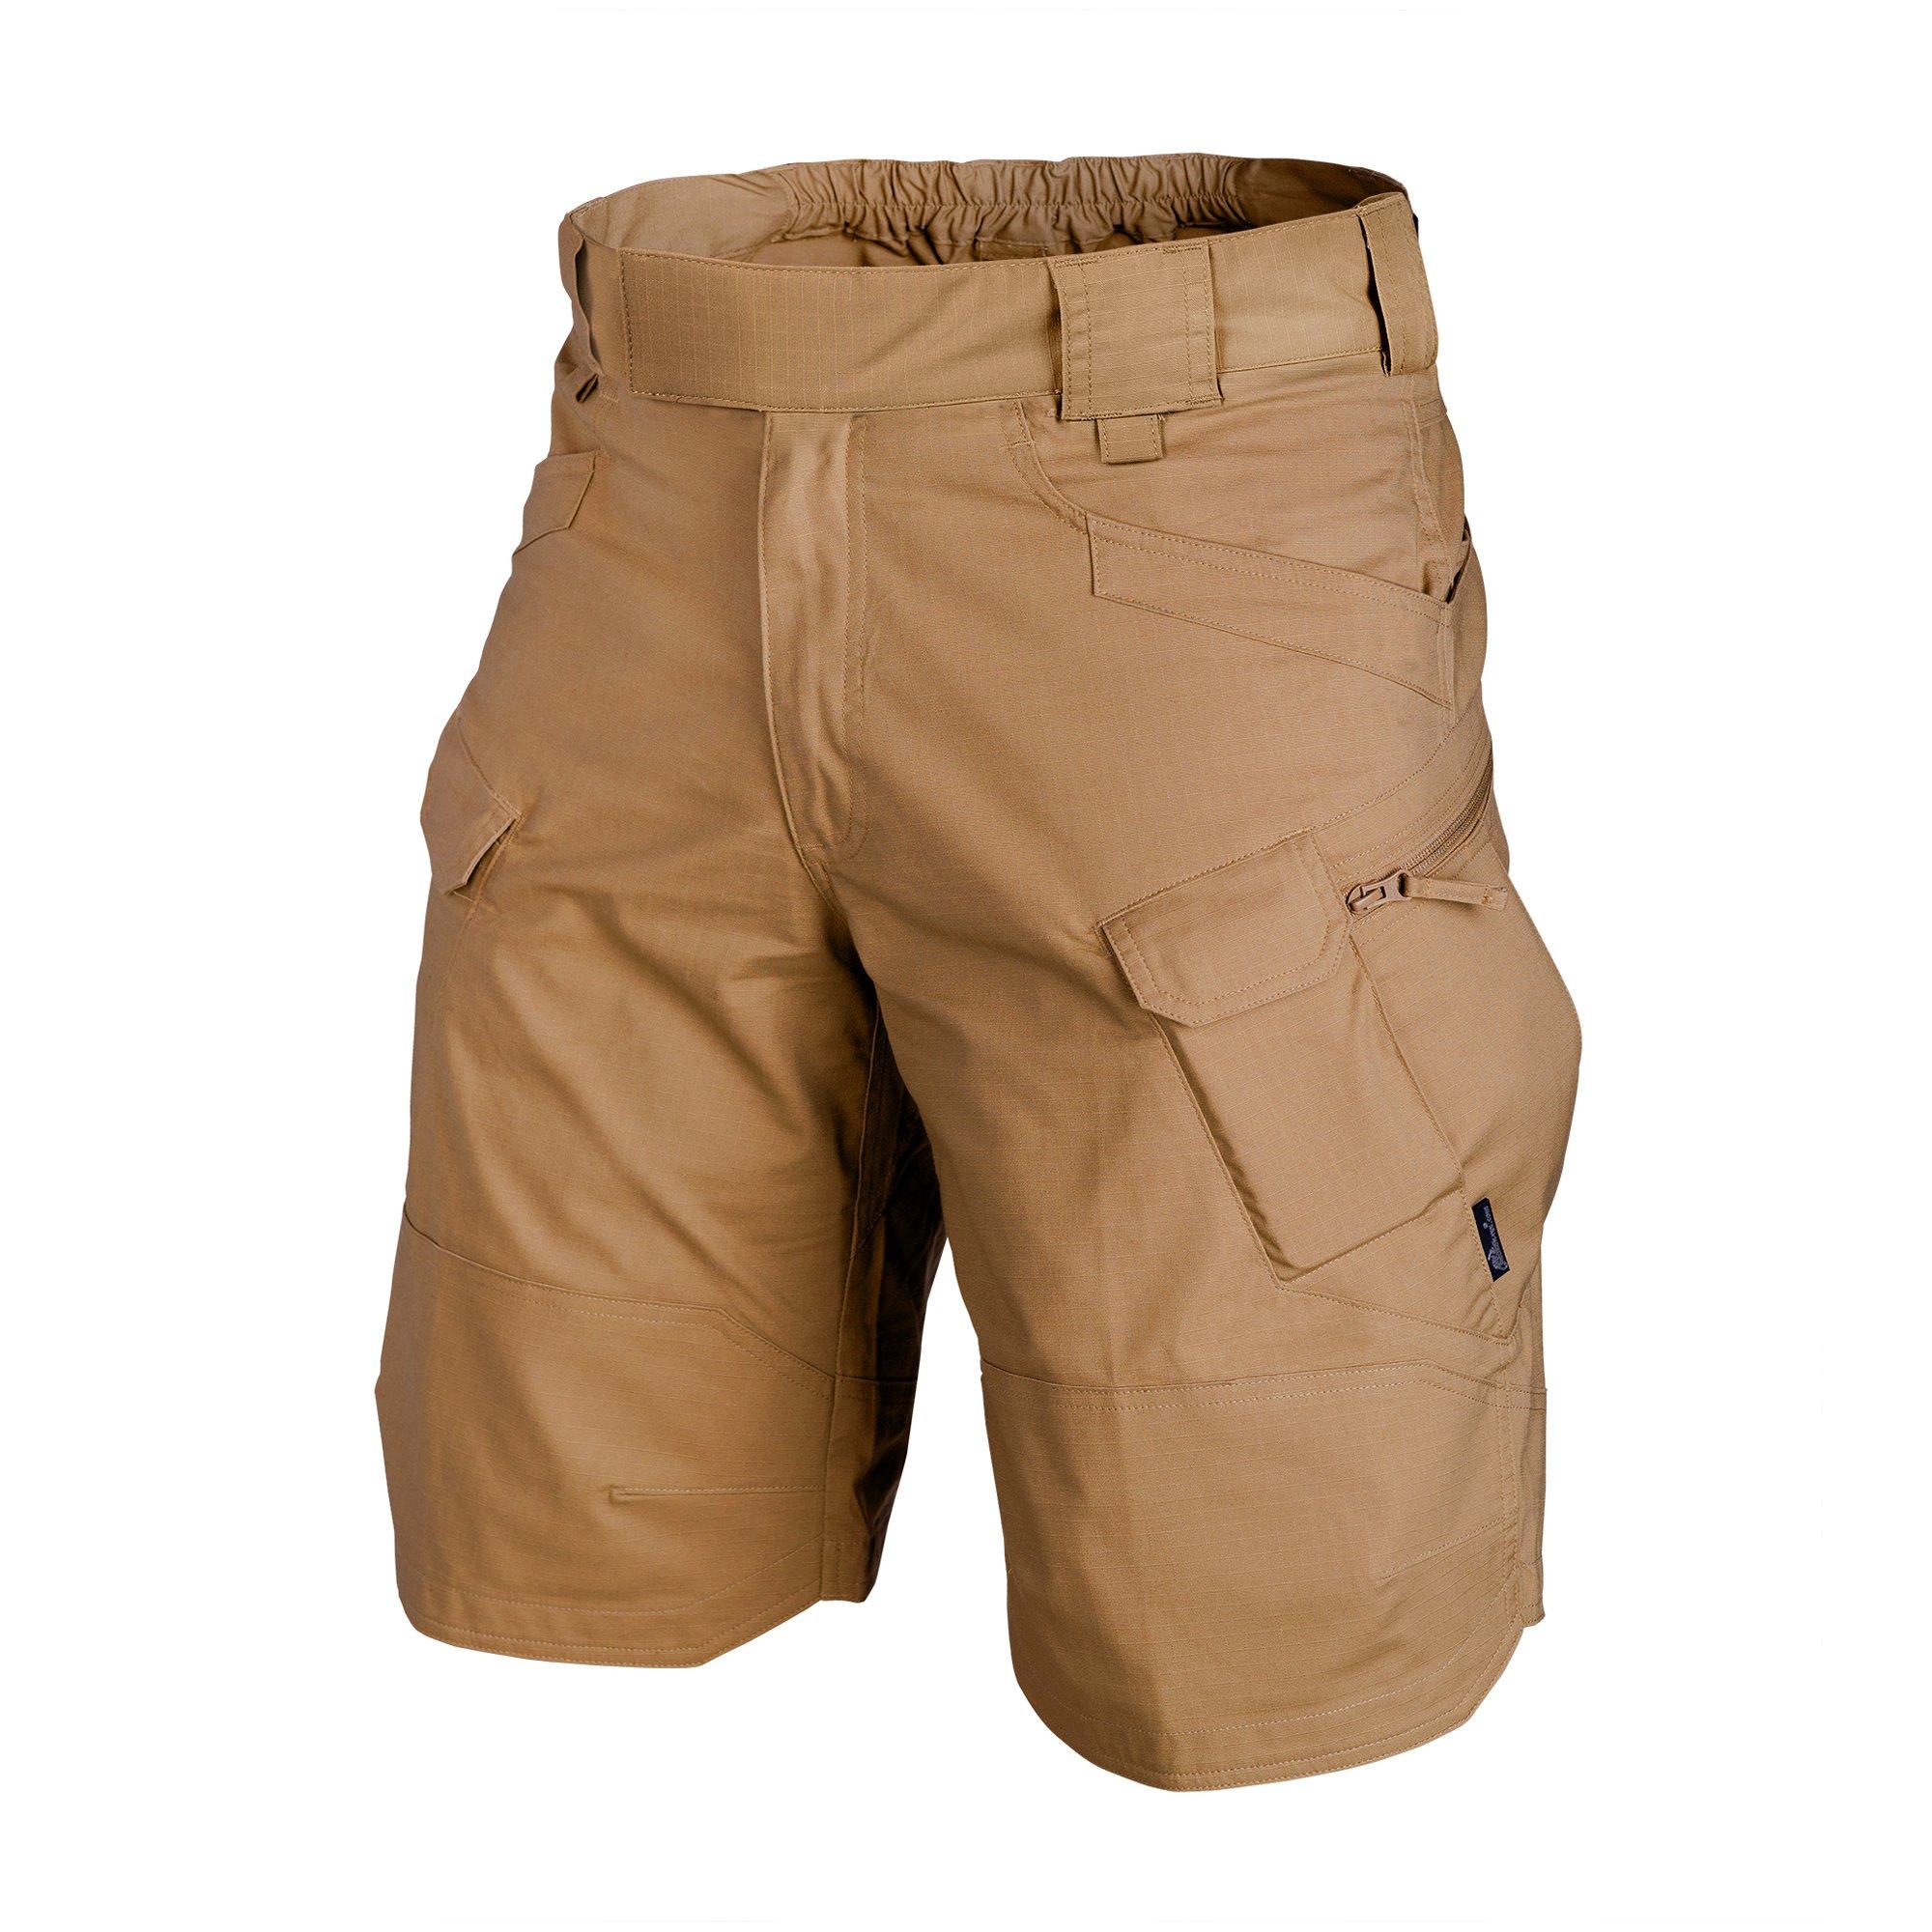 HELIKON-TEX Men's Urban Tactical Shorts 12'' Coyote size XL